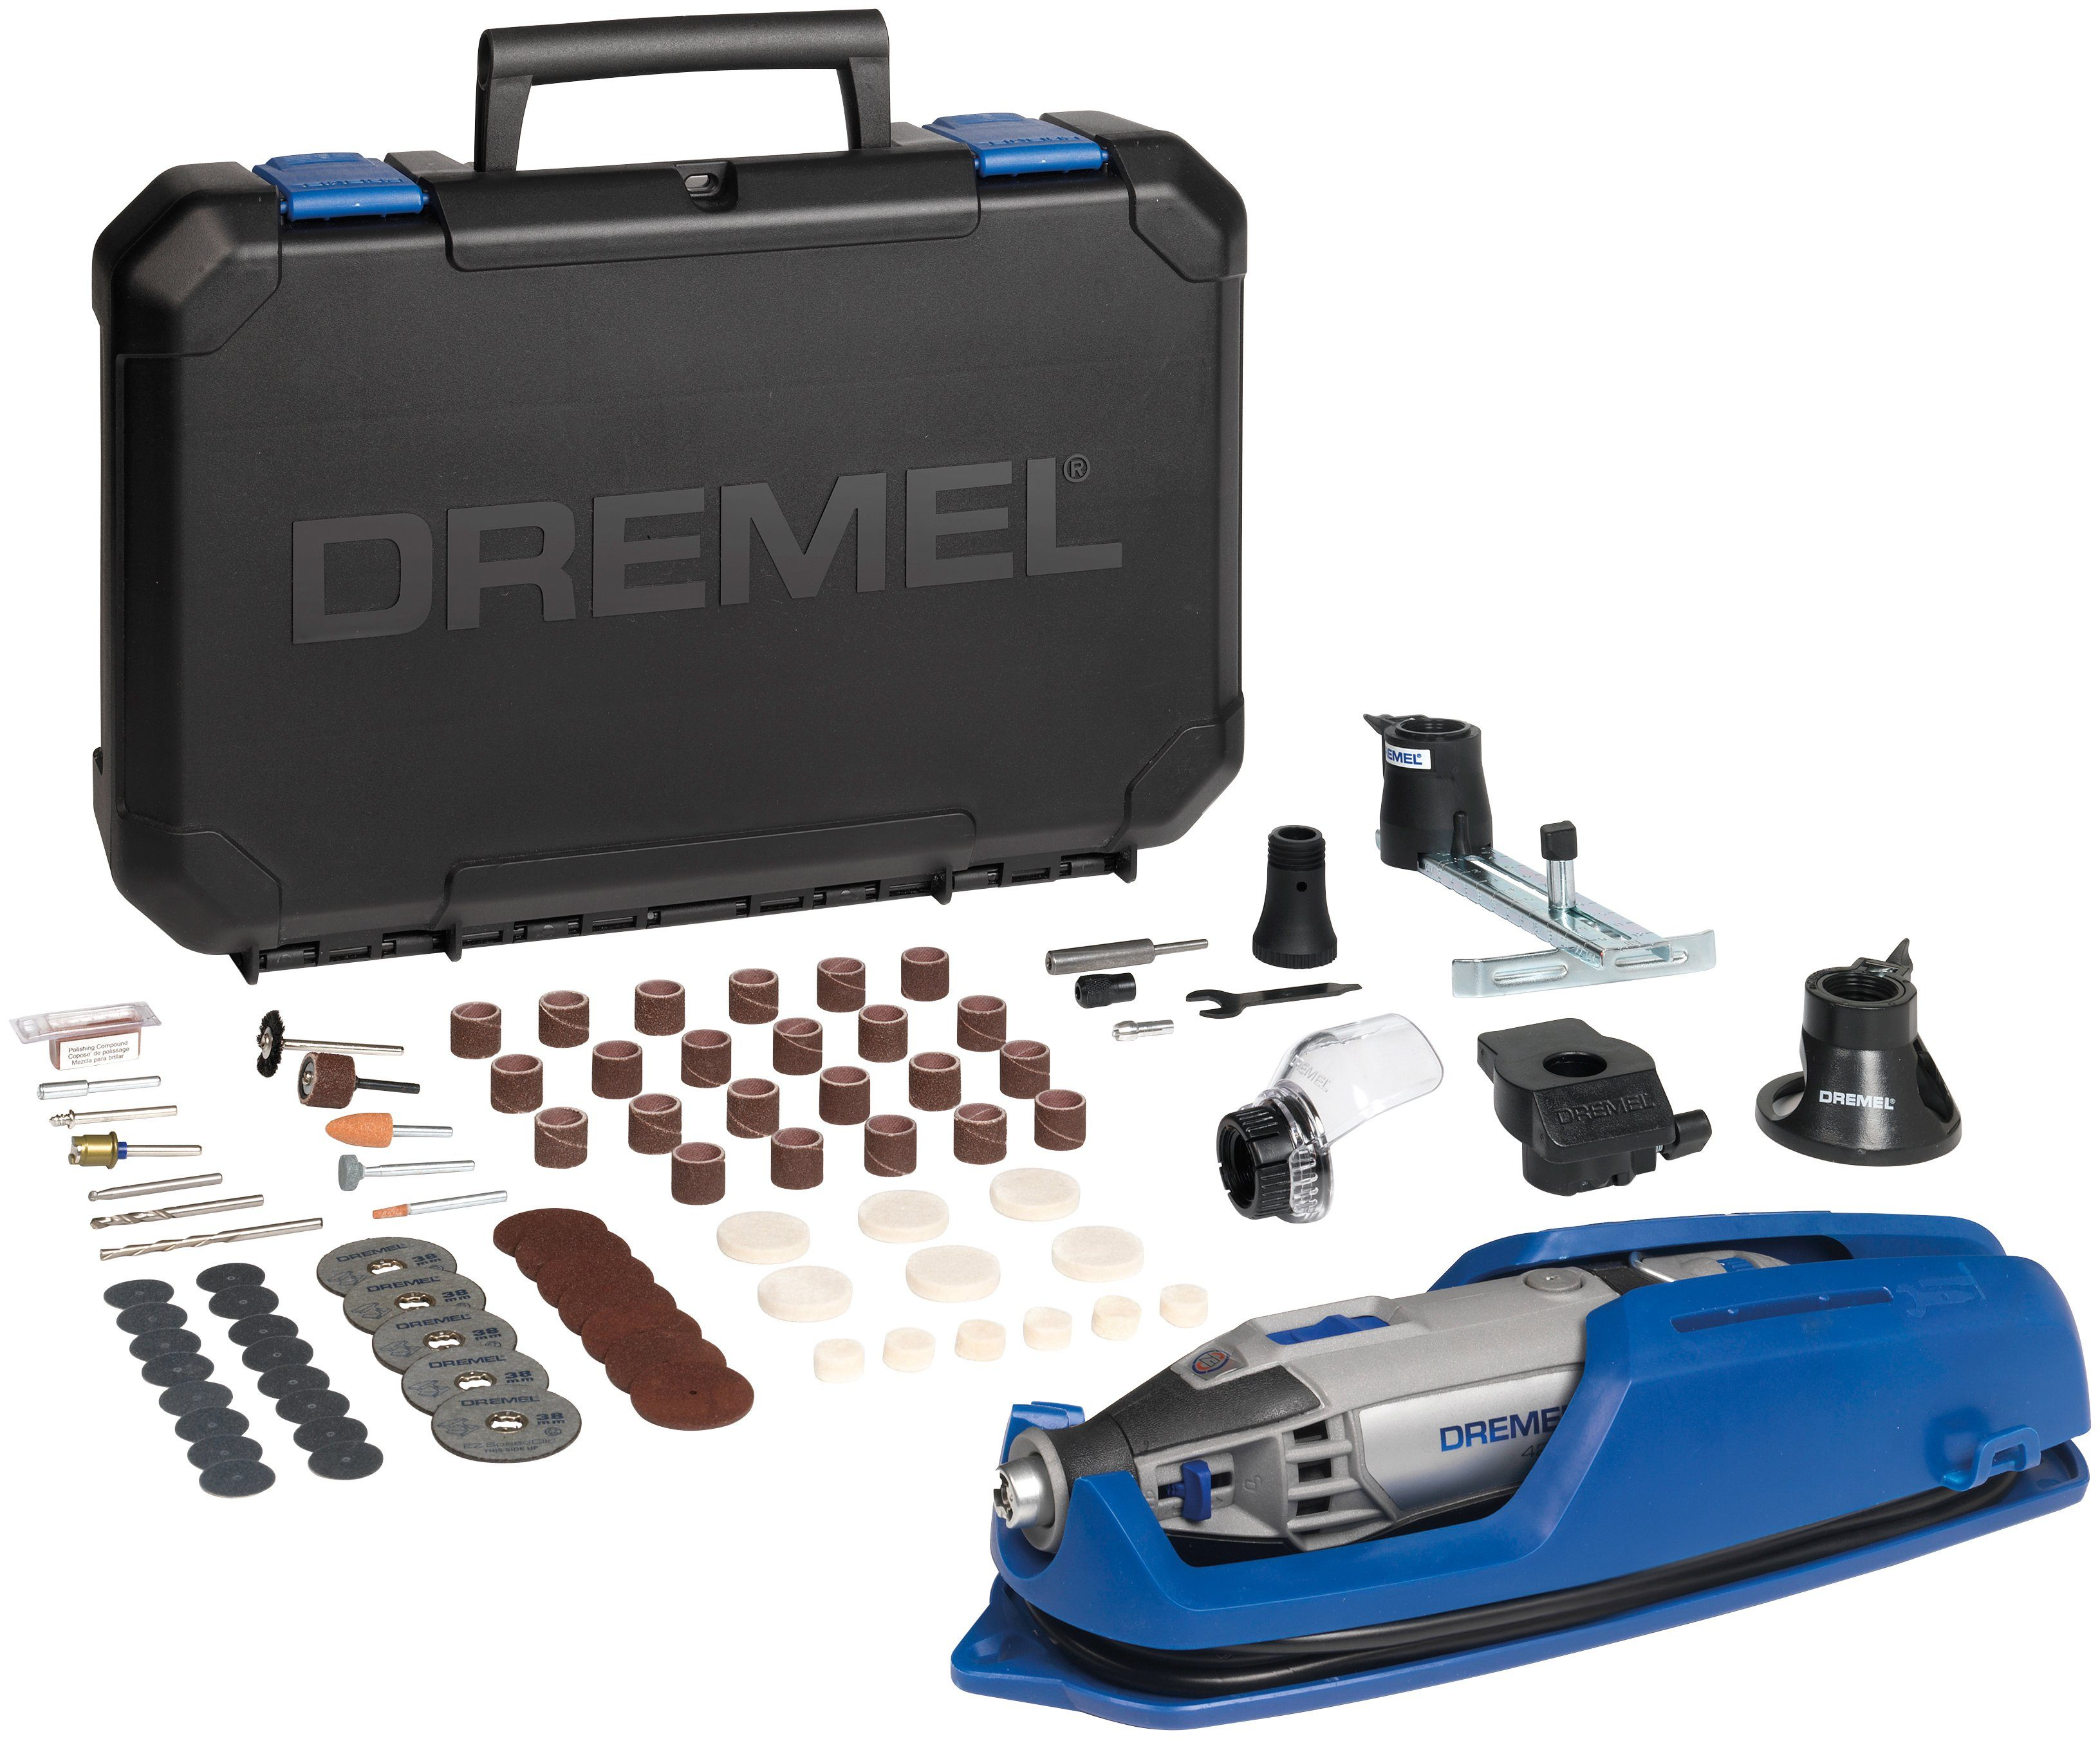 Dremel Multifunktionswerkzeug »Dremel® 4200 (4200-4/75 EZ)«